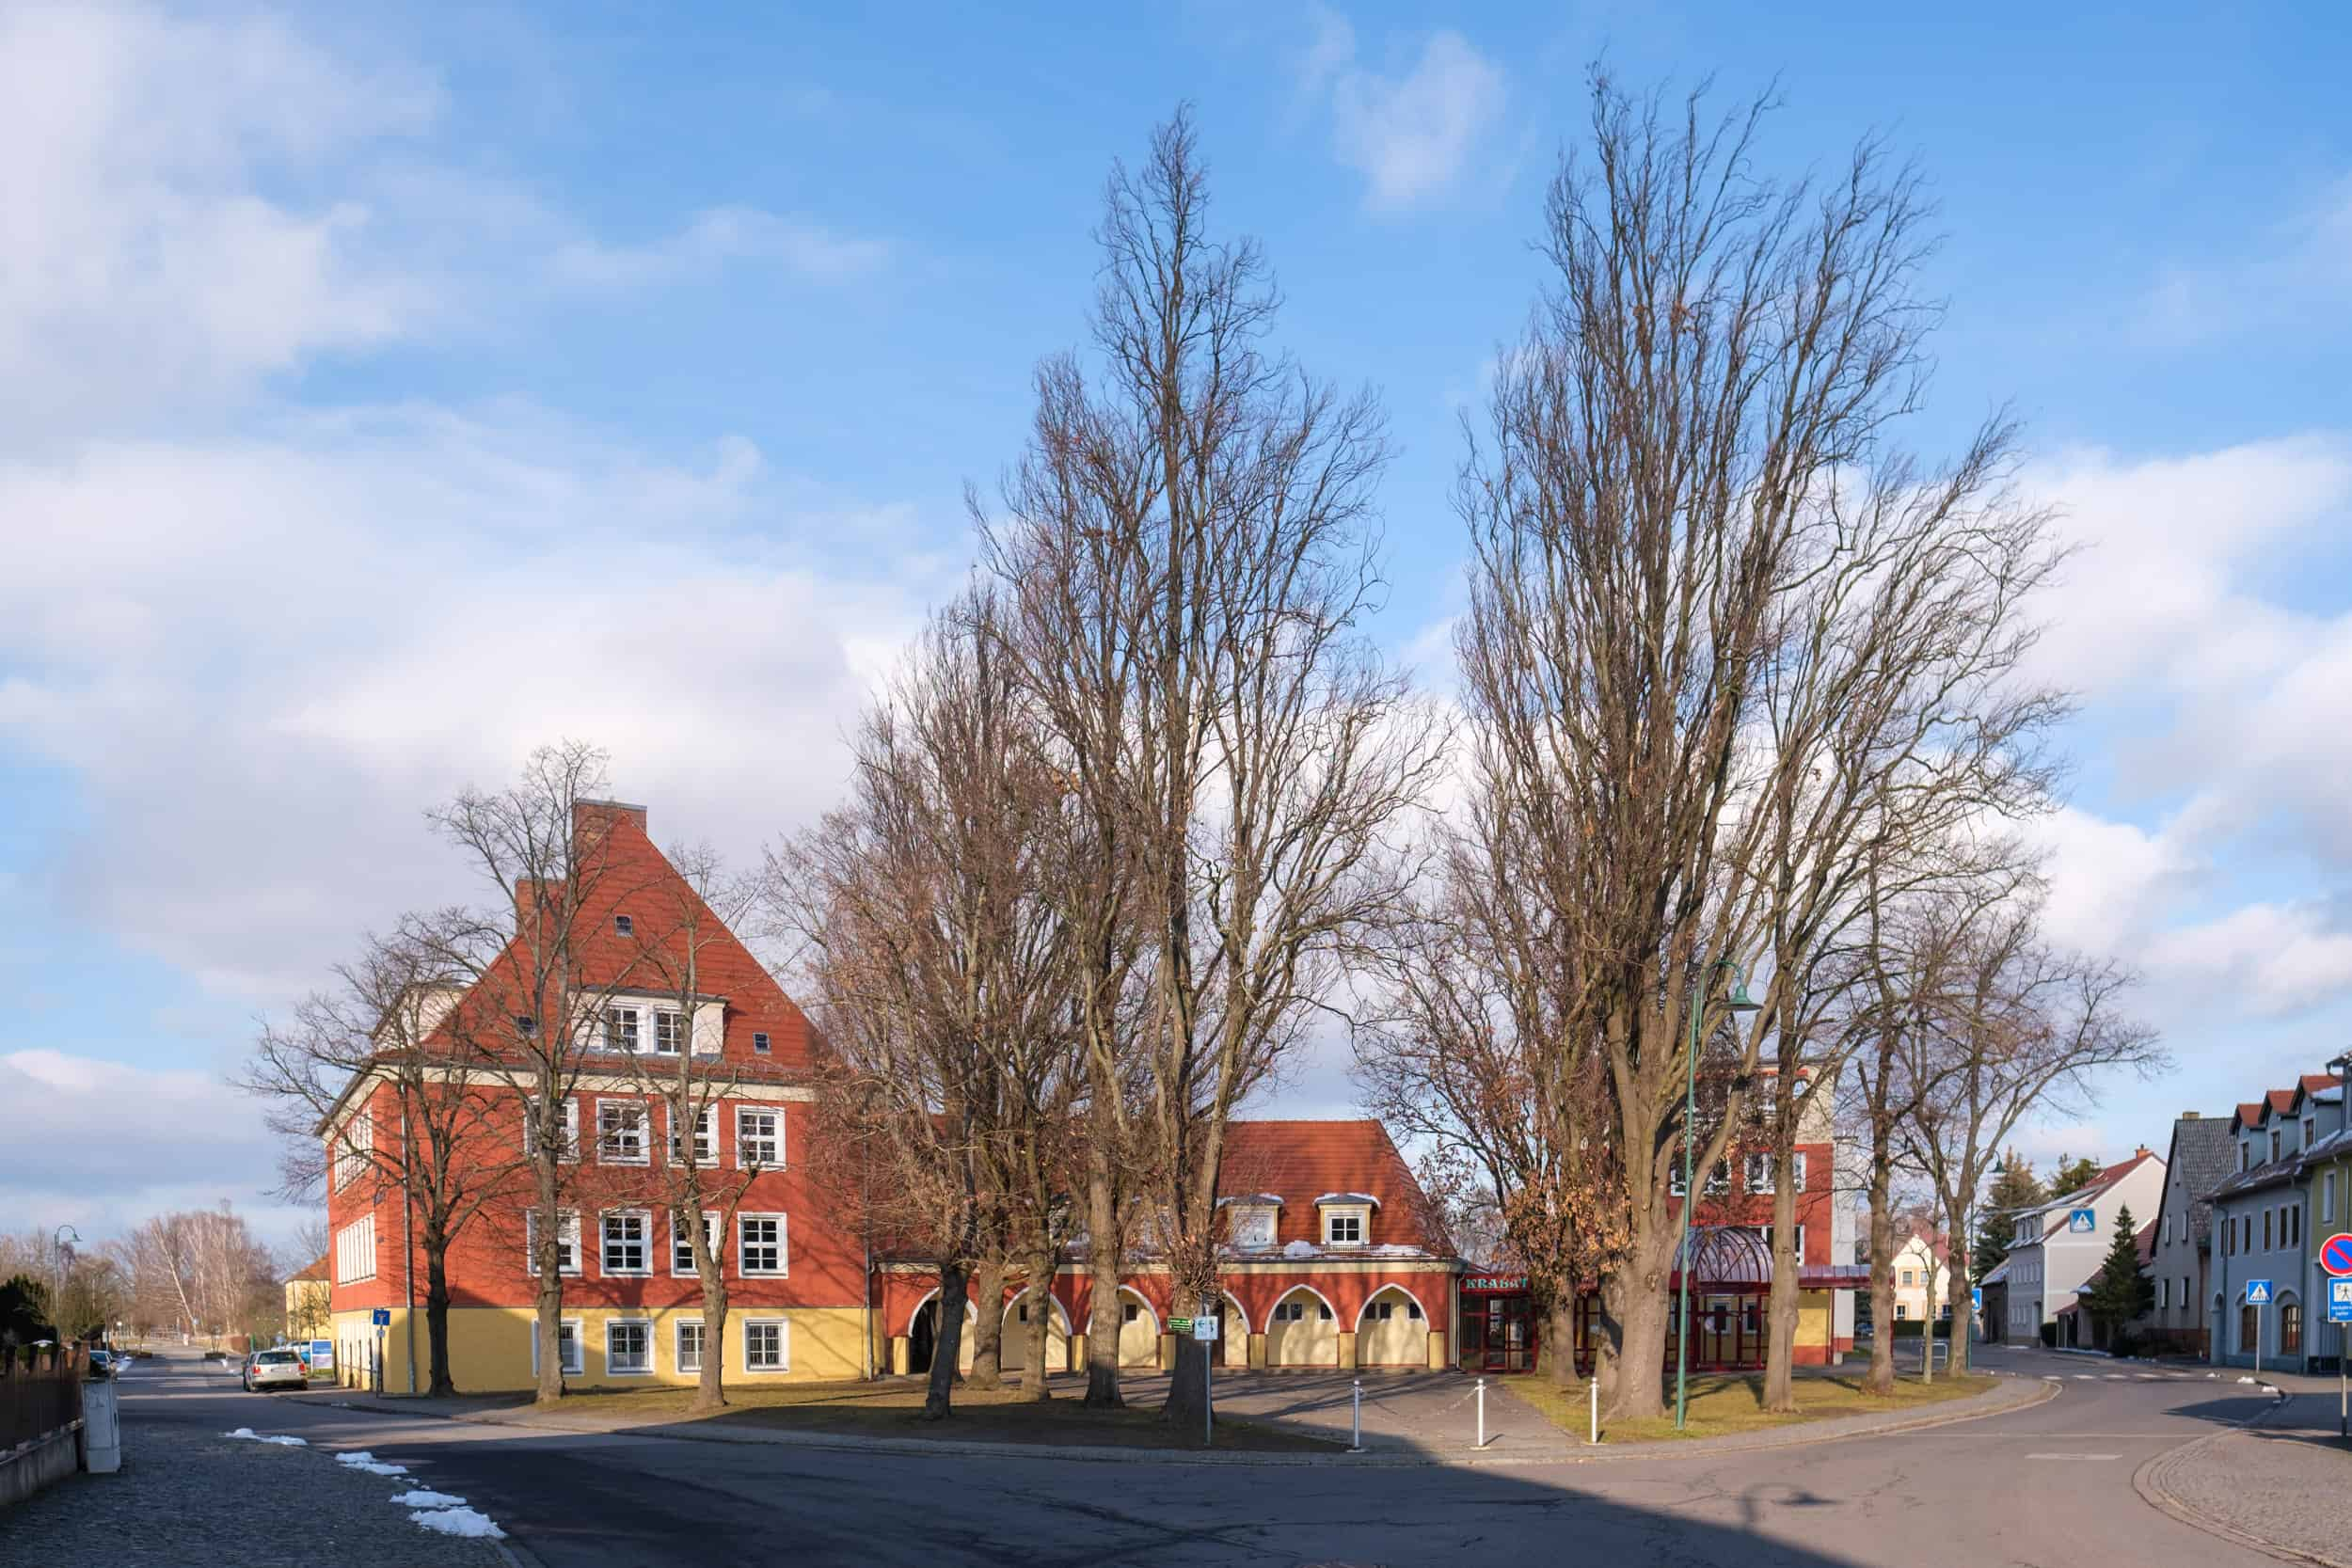 Grundschule Wittichenau